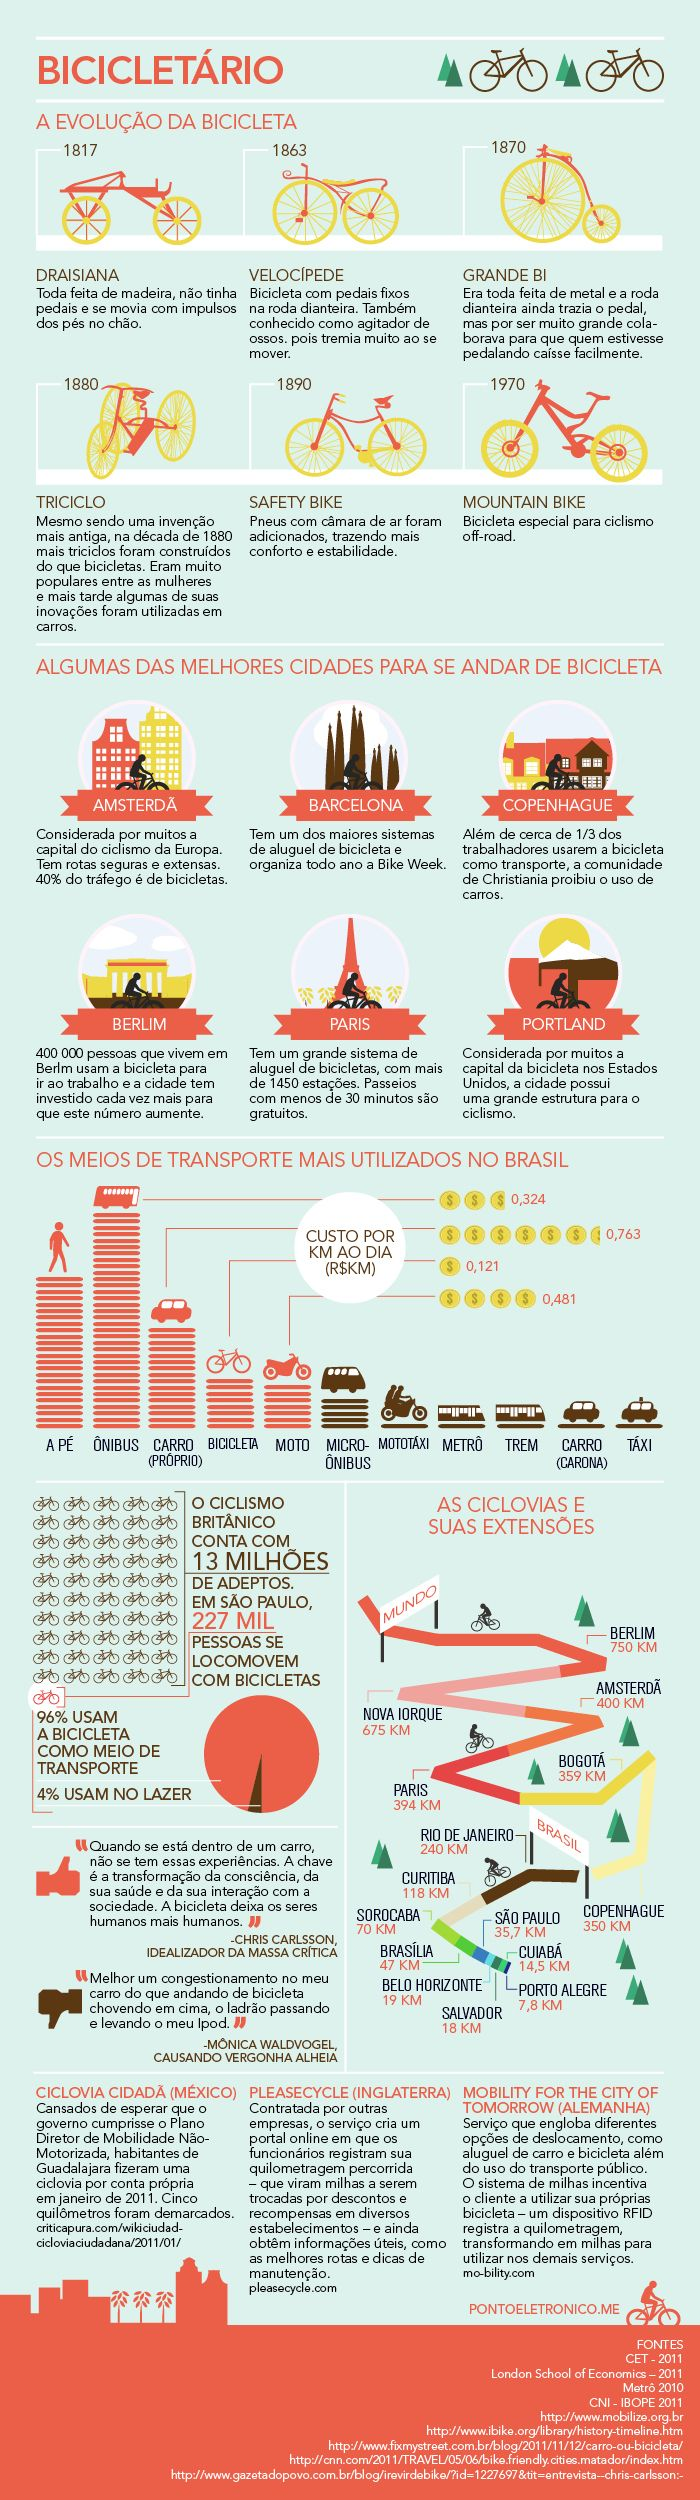 Infográfico mostra atraso de estrutura para bikes no Brasil